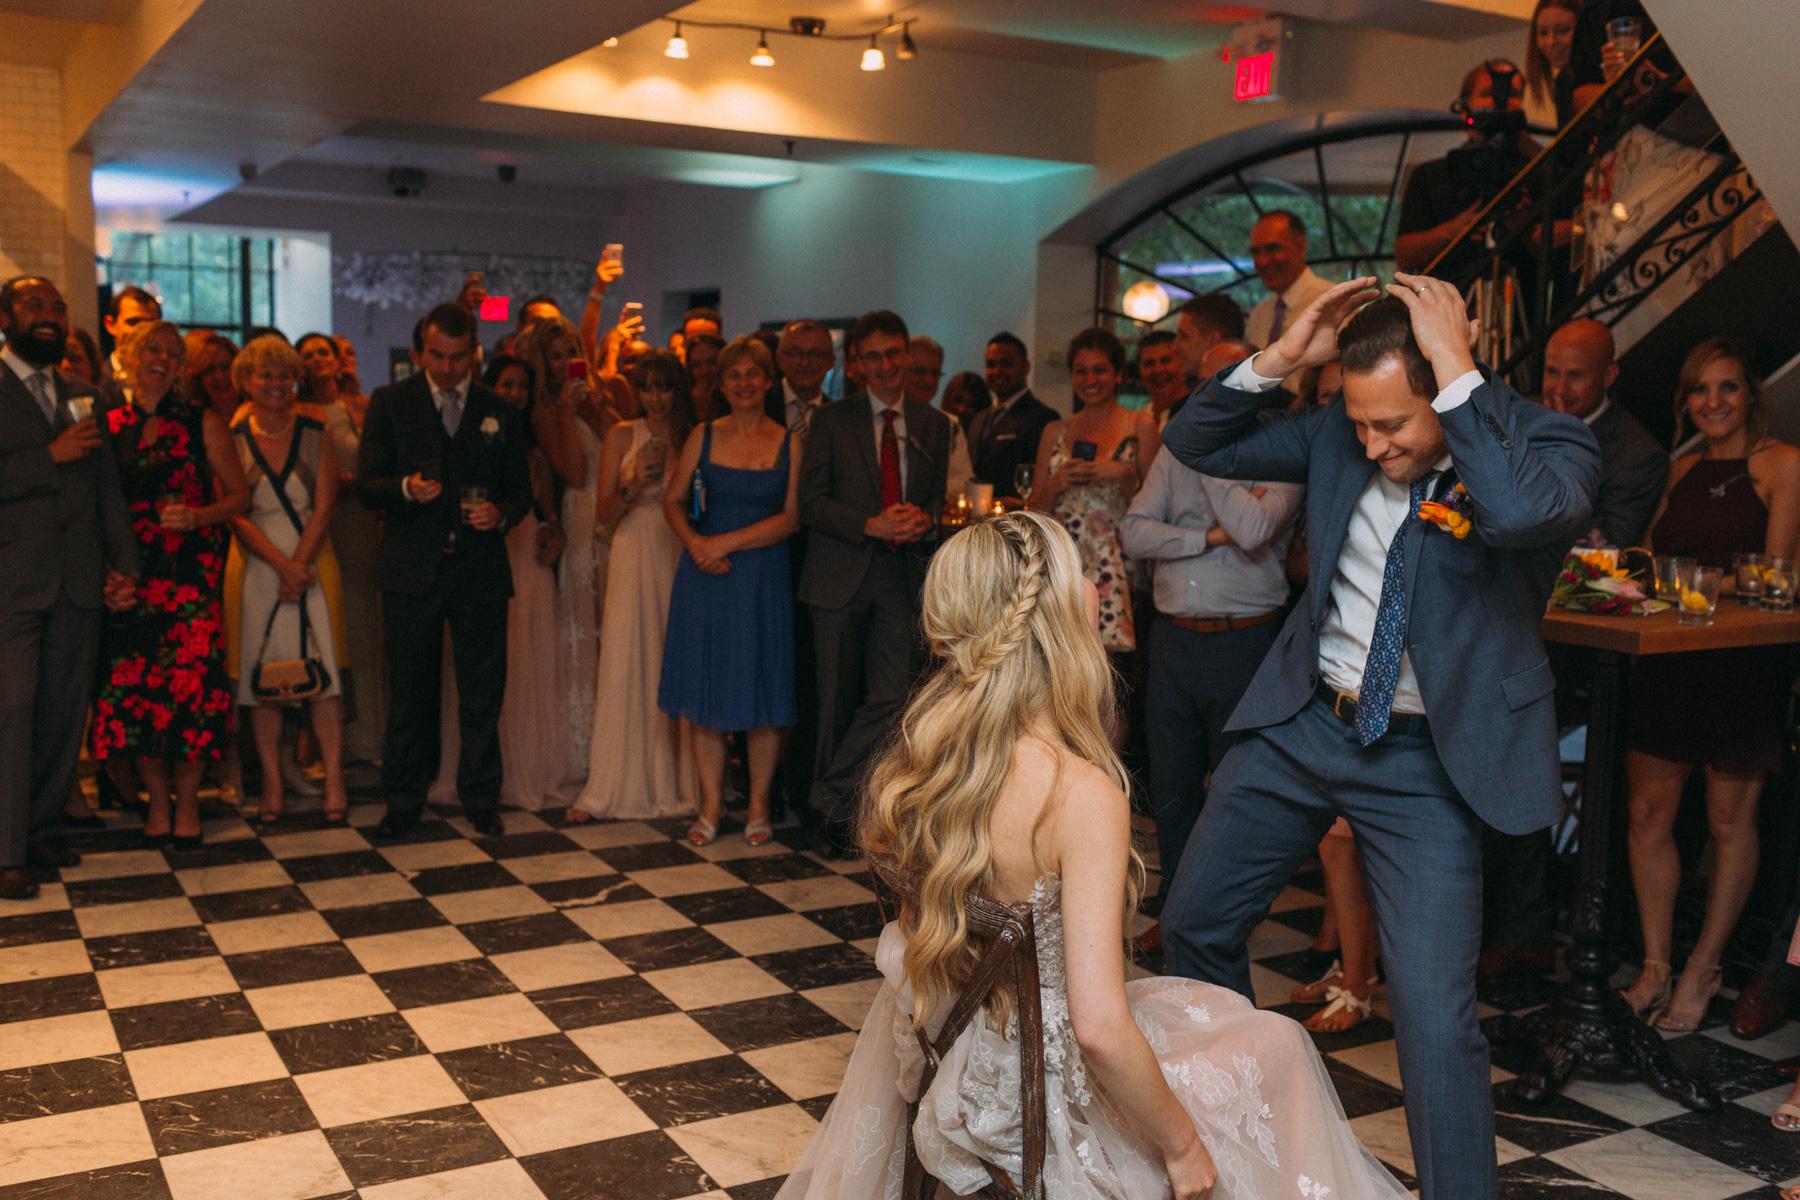 La-Maquette-wedding-by-Toronto-modern-wedding-photographer-Sam-Wong_37.jpg